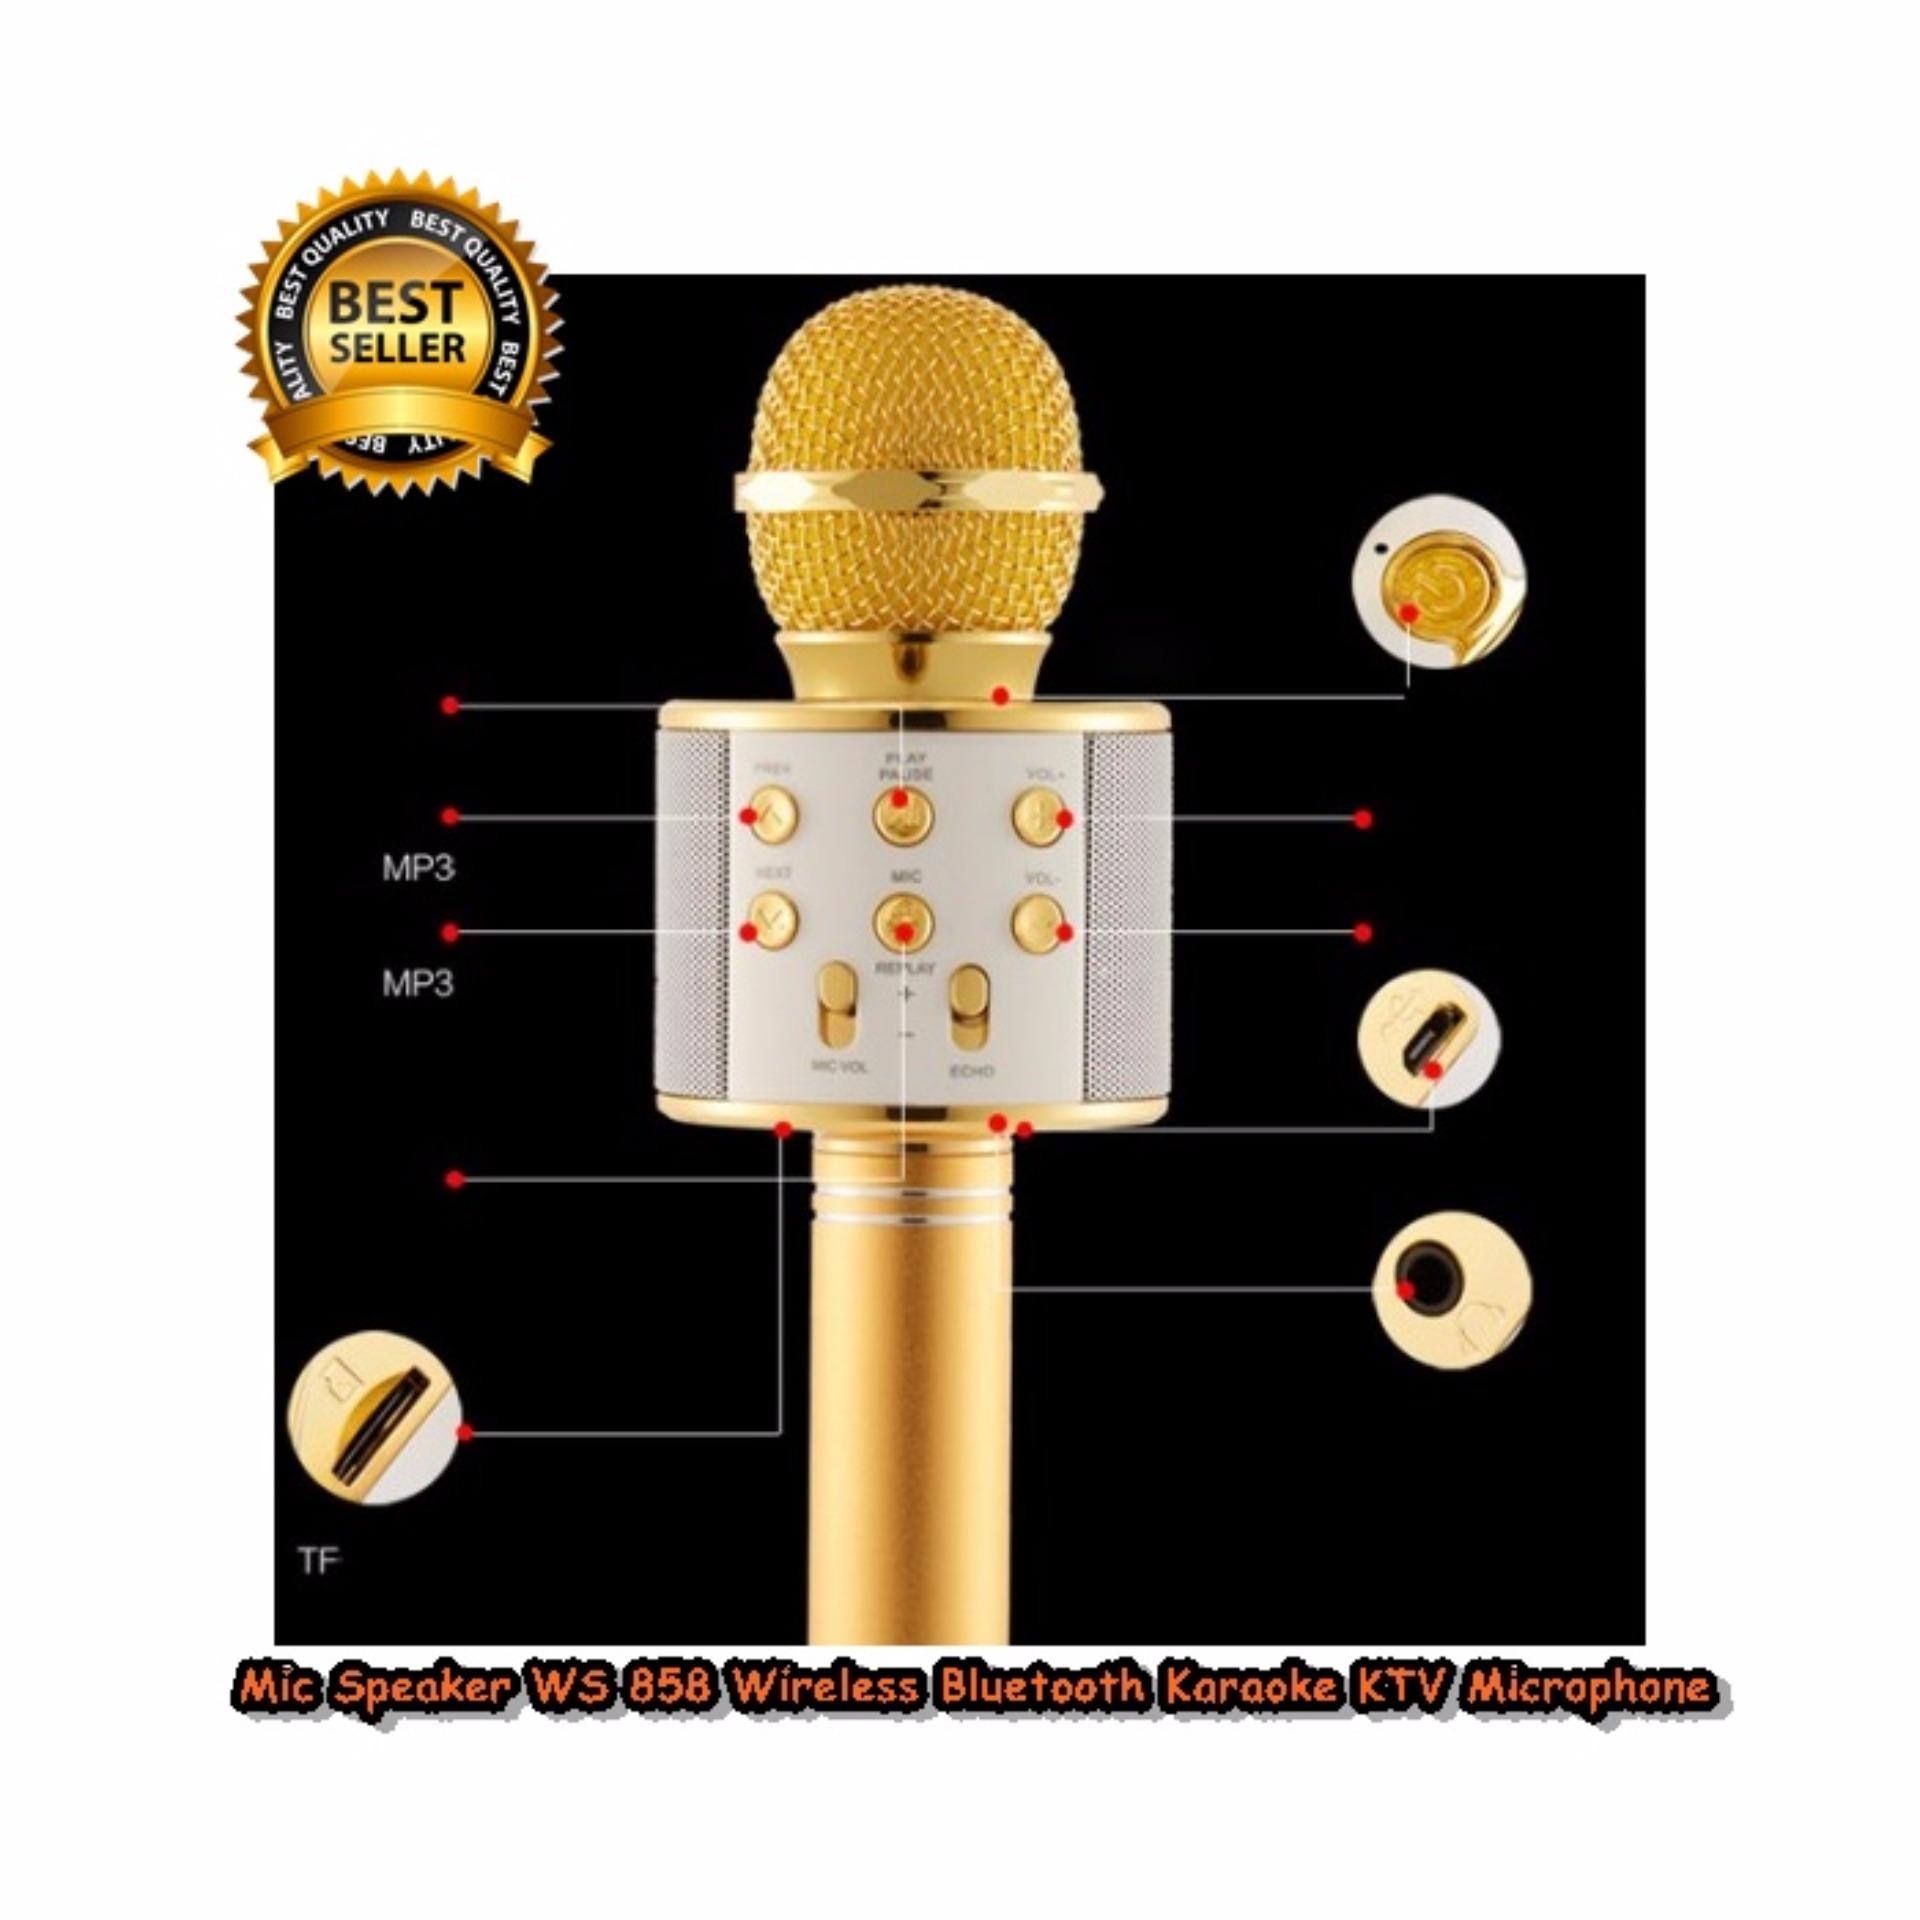 Jual Mic Speaker Ws Murah Garansi Dan Berkualitas Id Store Bluetooth Karaoke Smule Wster 858 Original Wireless Portable Ws858 Atau Speakeridr315000 Rp 321000